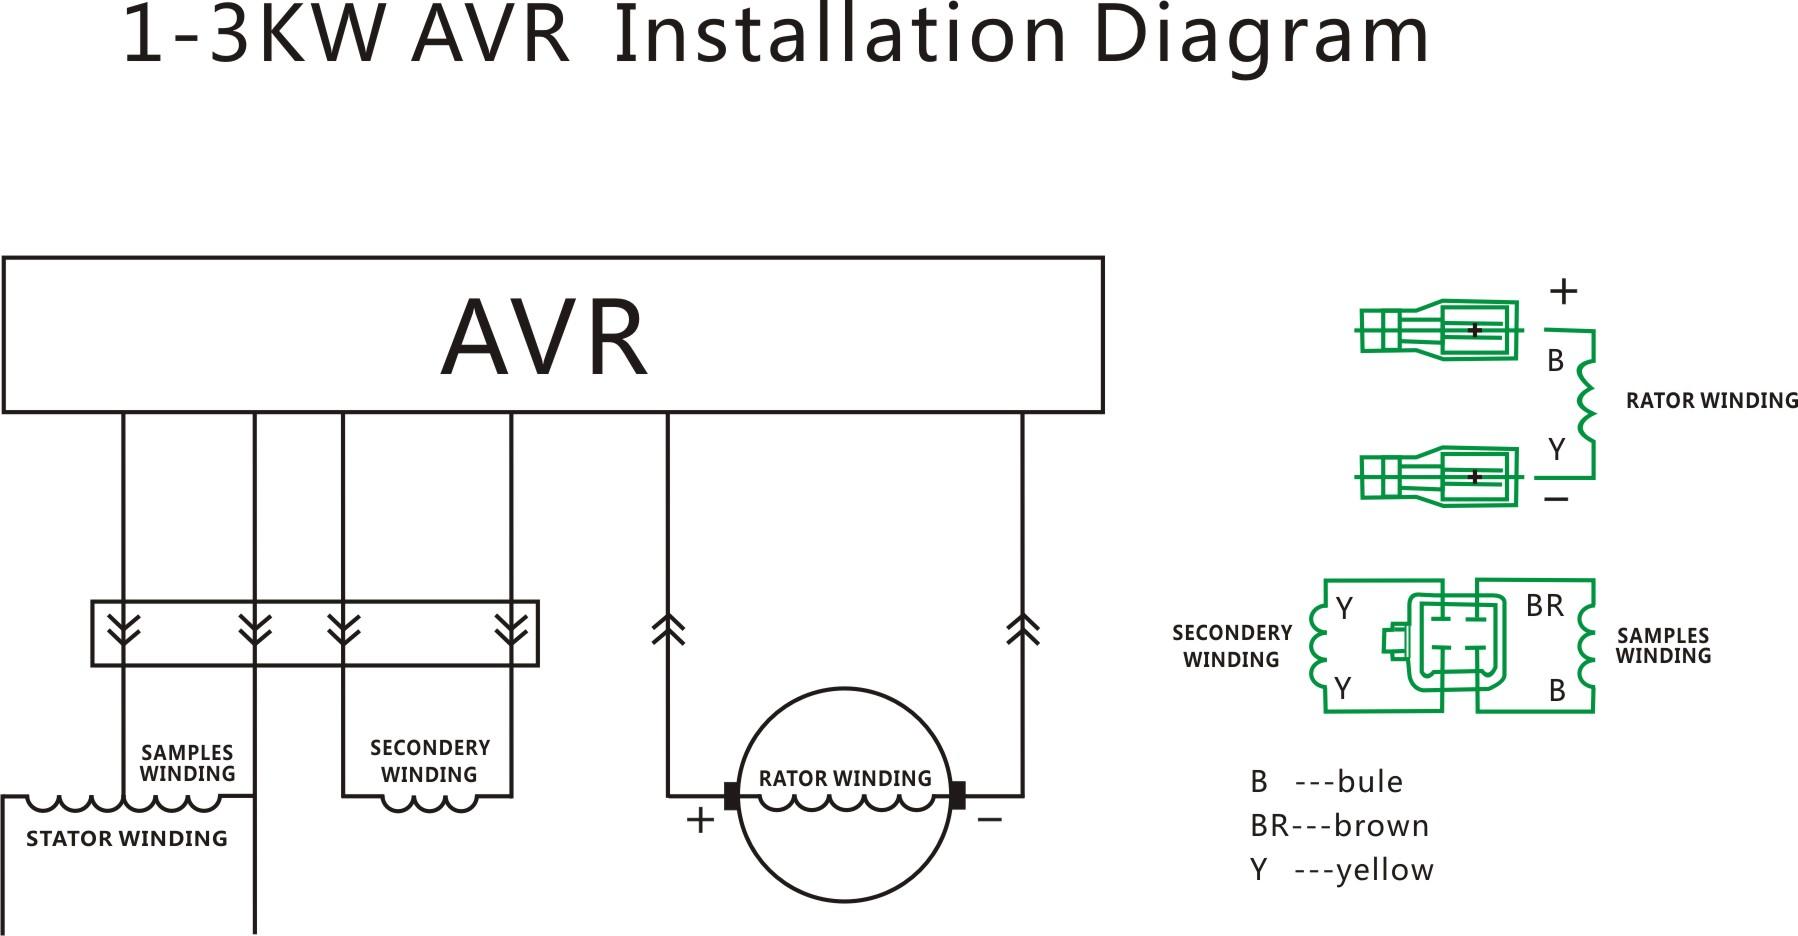 hight resolution of avr generator wiring diagram wiring diagrams generator onan wiring circuit diagram avr generator wiring diagram